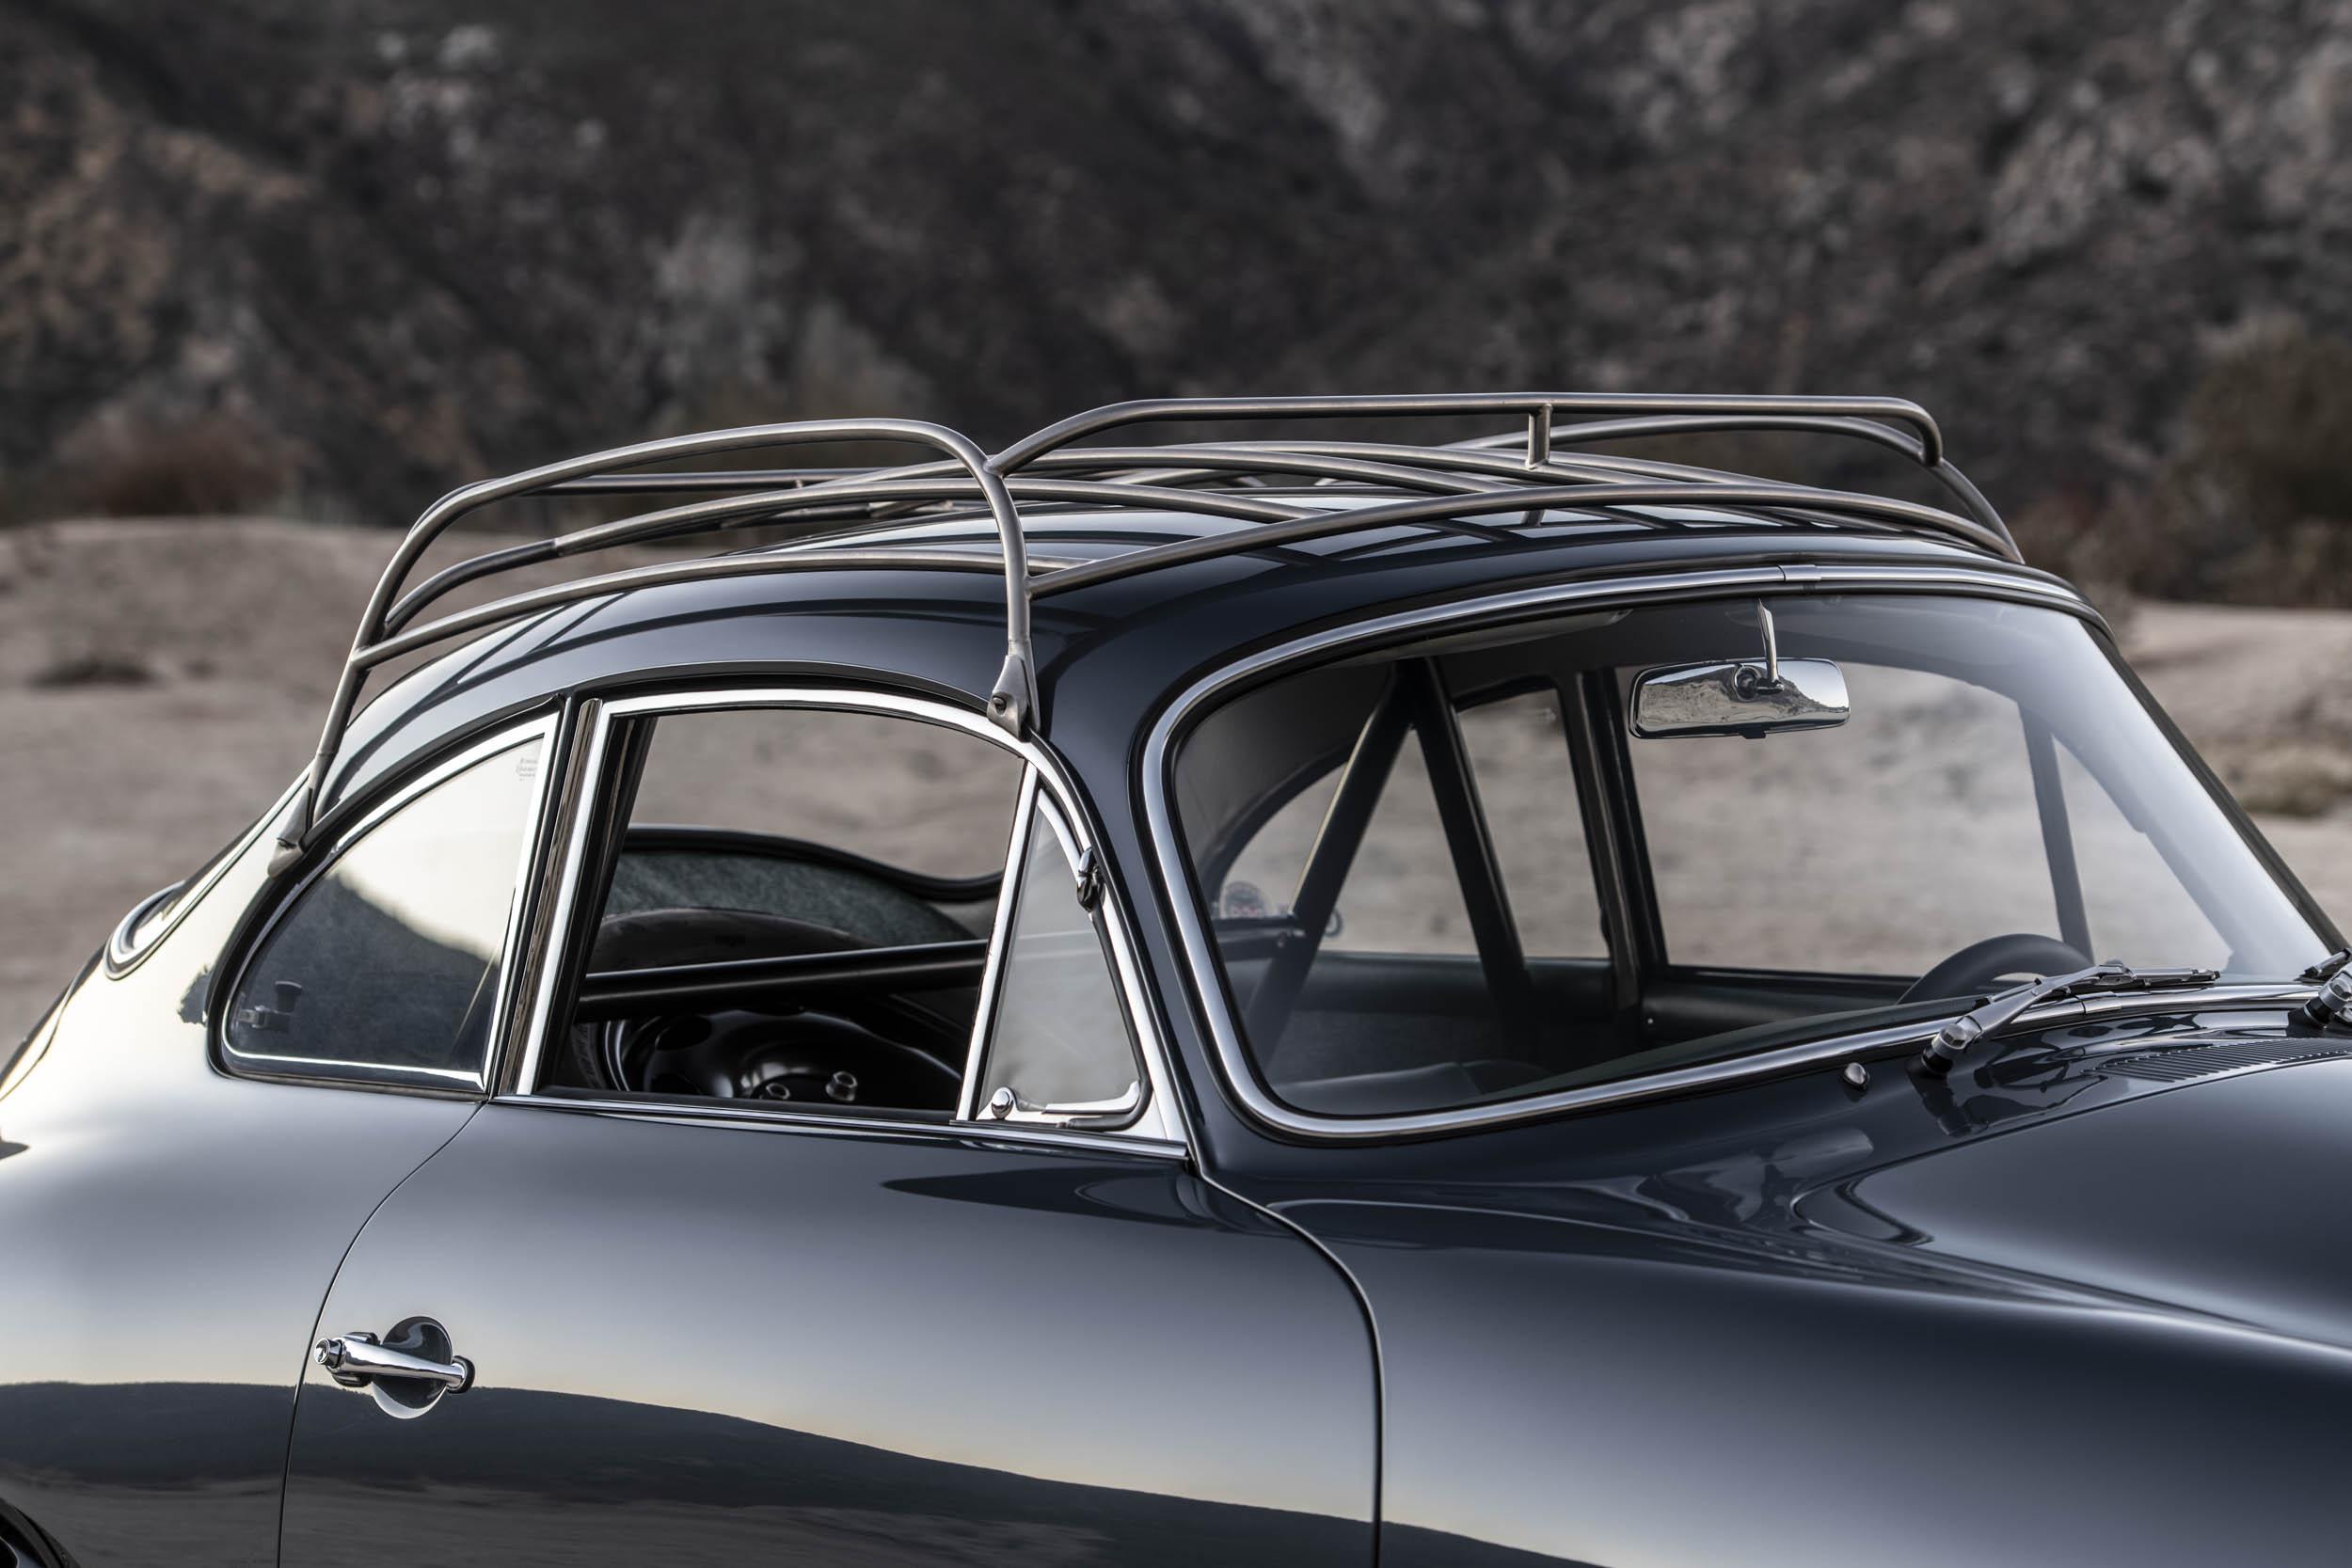 Emory Porsche 356 C4S Allrad roof rack